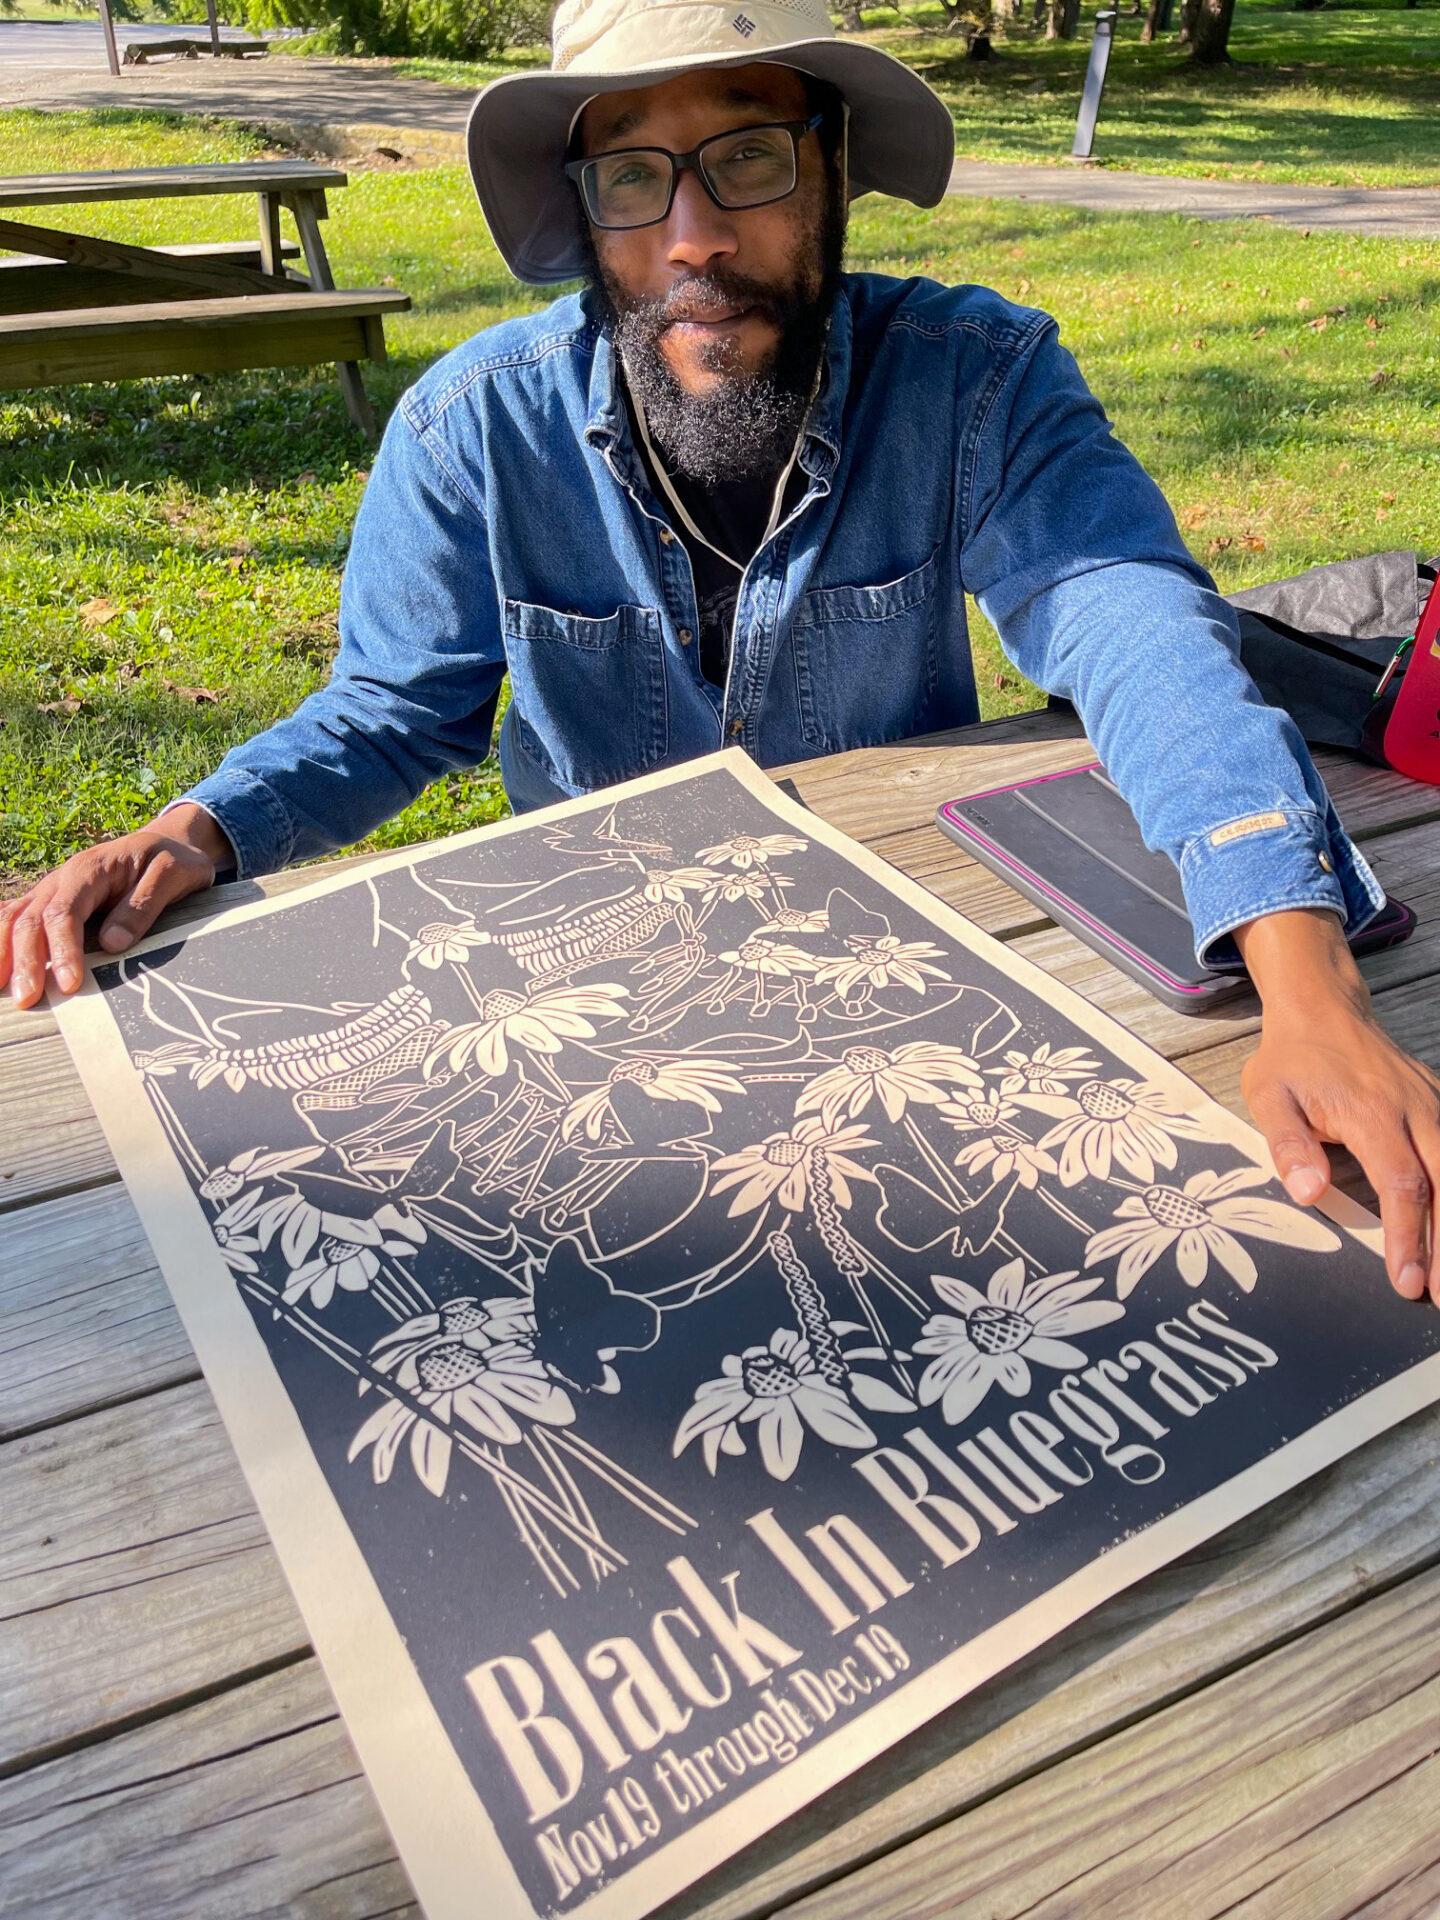 2021 AIR Norman Spencer Celebrates Black Joy in Nature